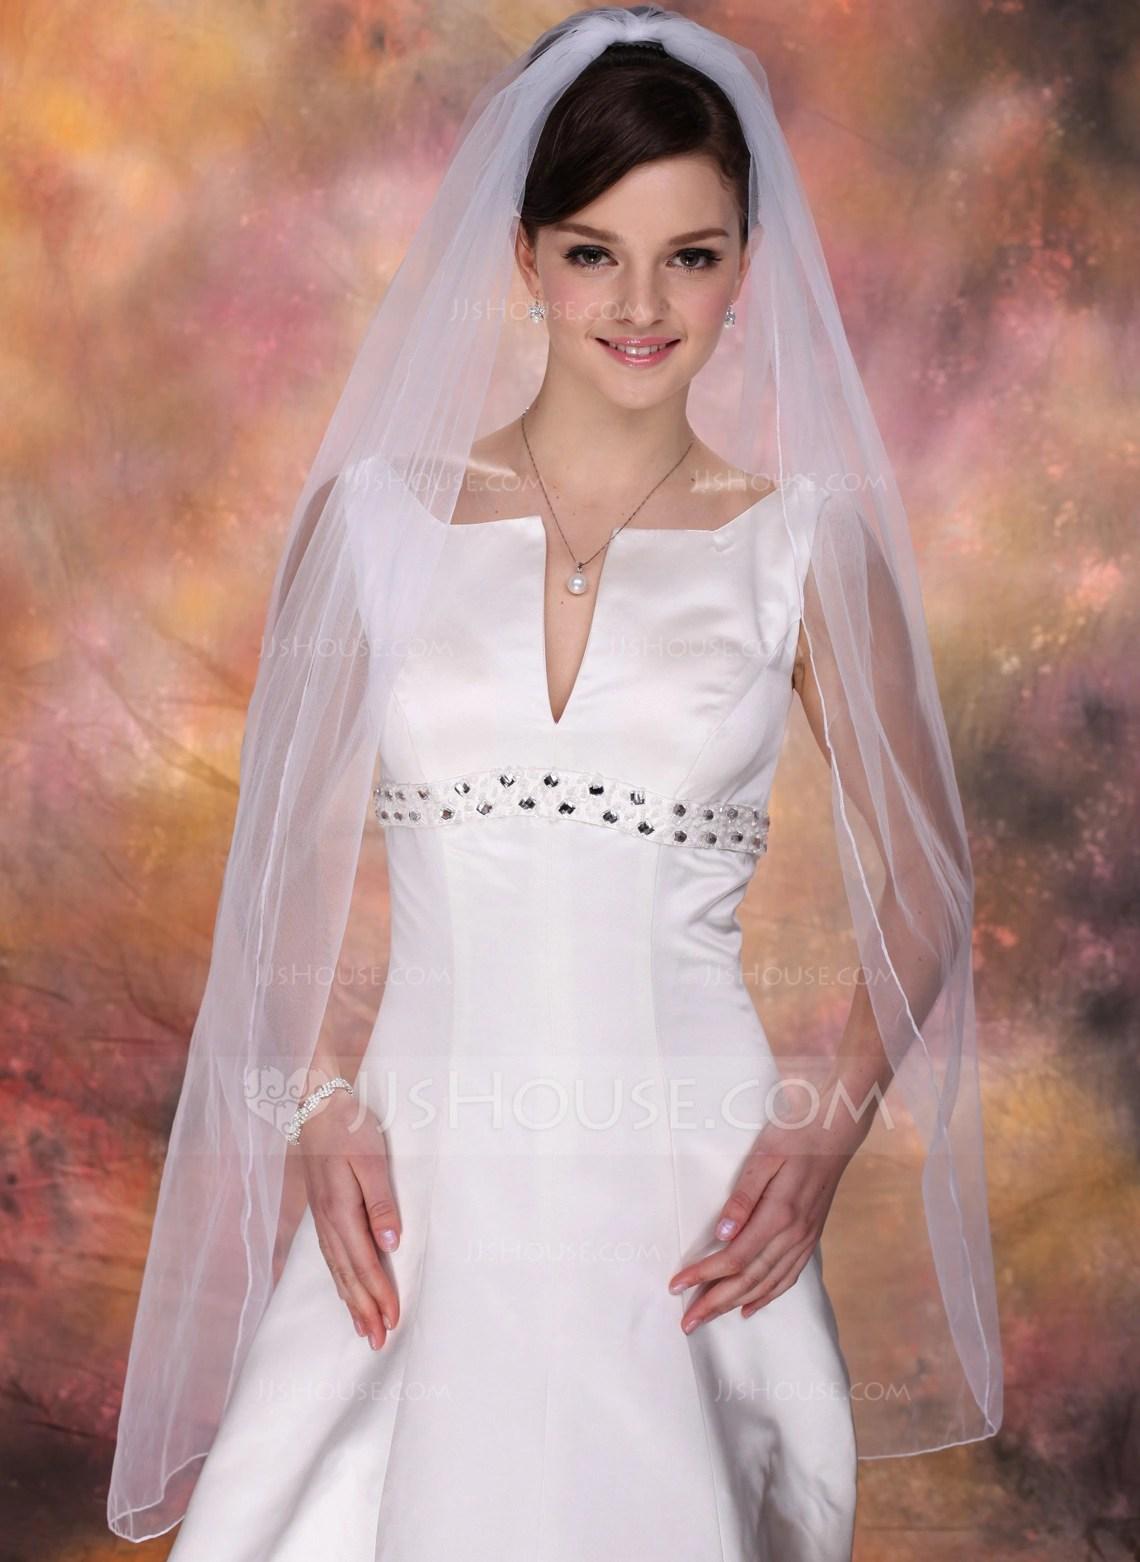 Onetier Waltz Bridal Veils With Pencil Edge 006020342